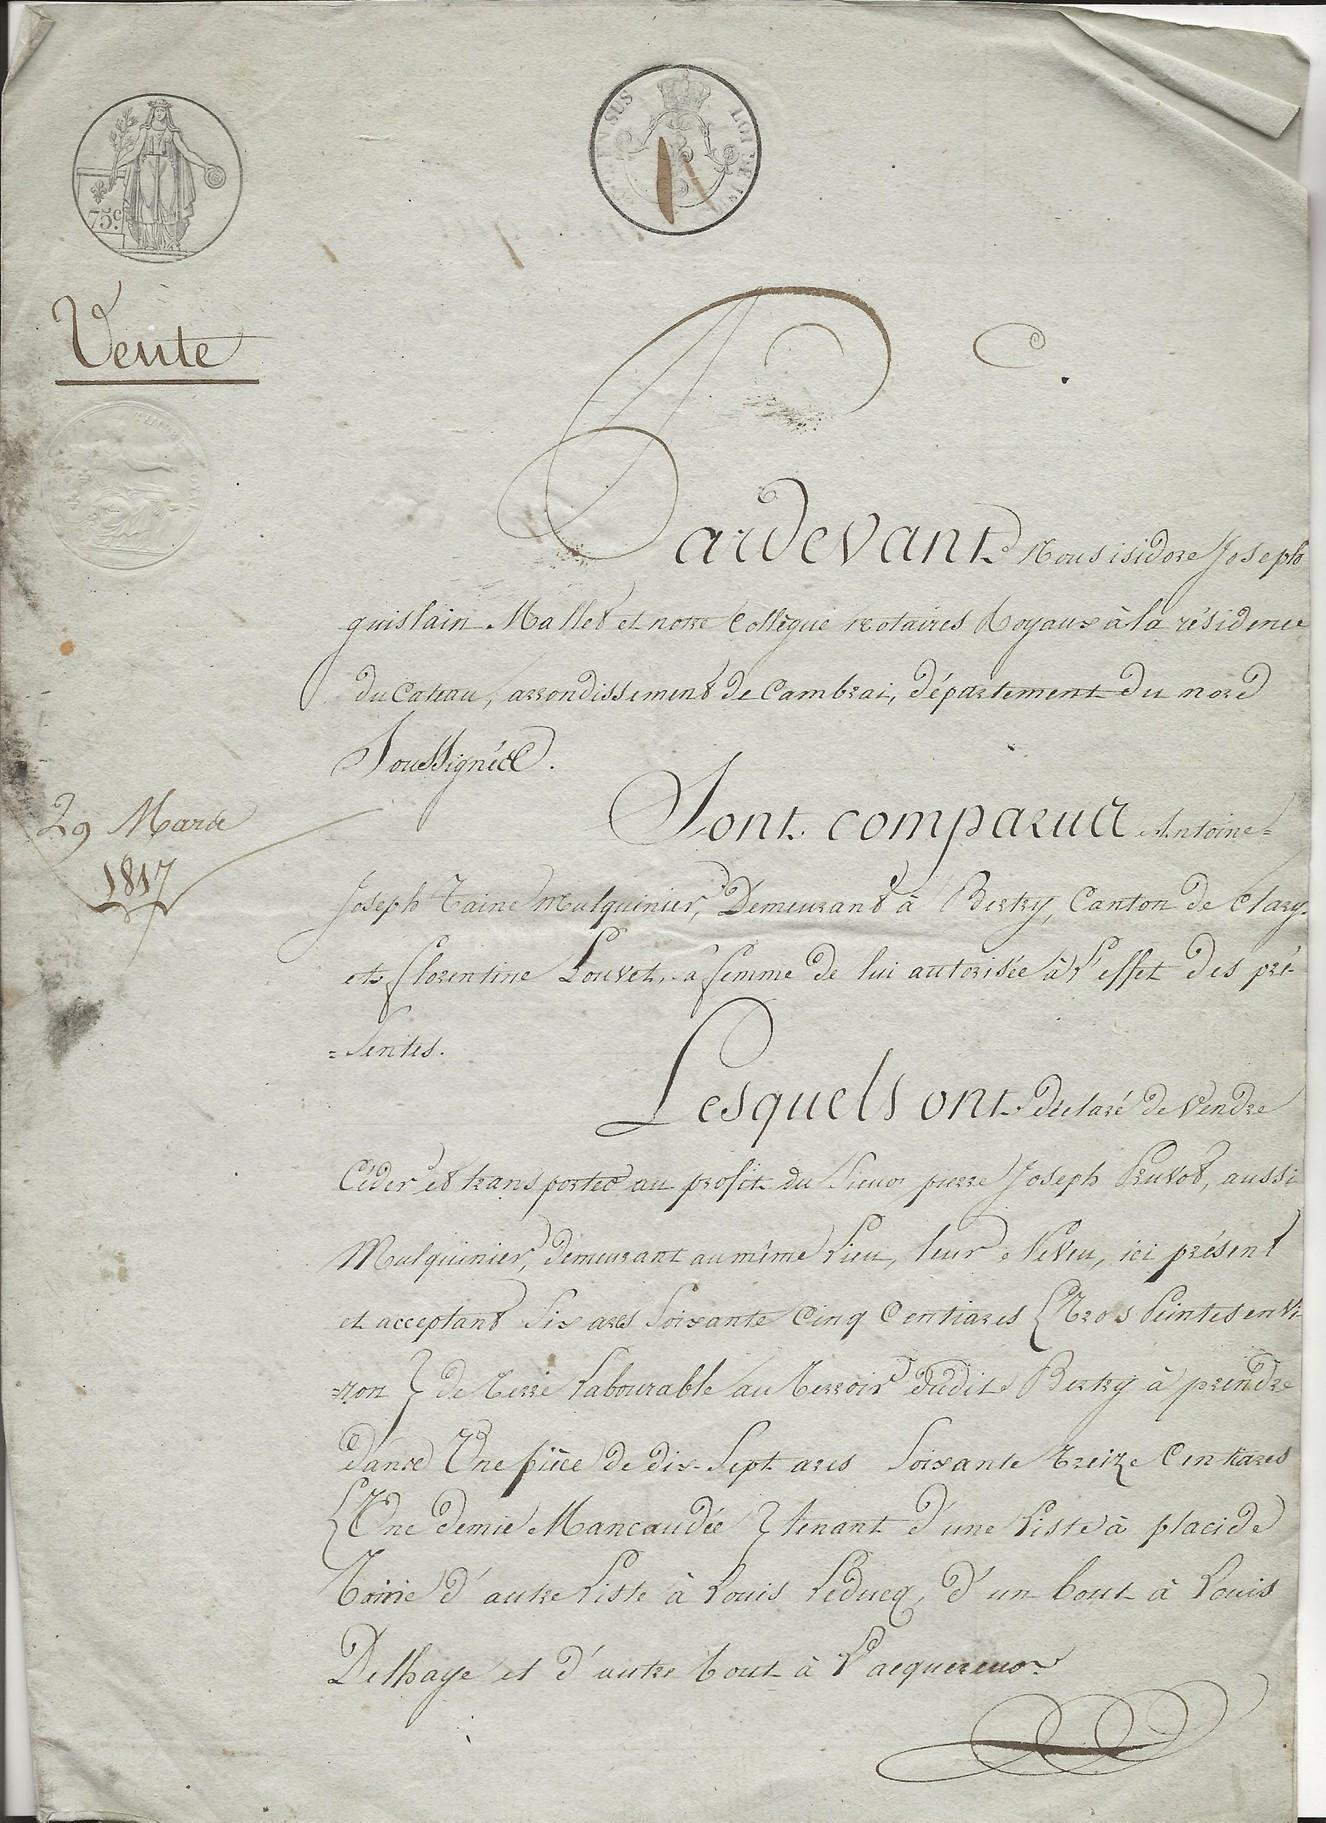 1817 vente taine a pruvot 001